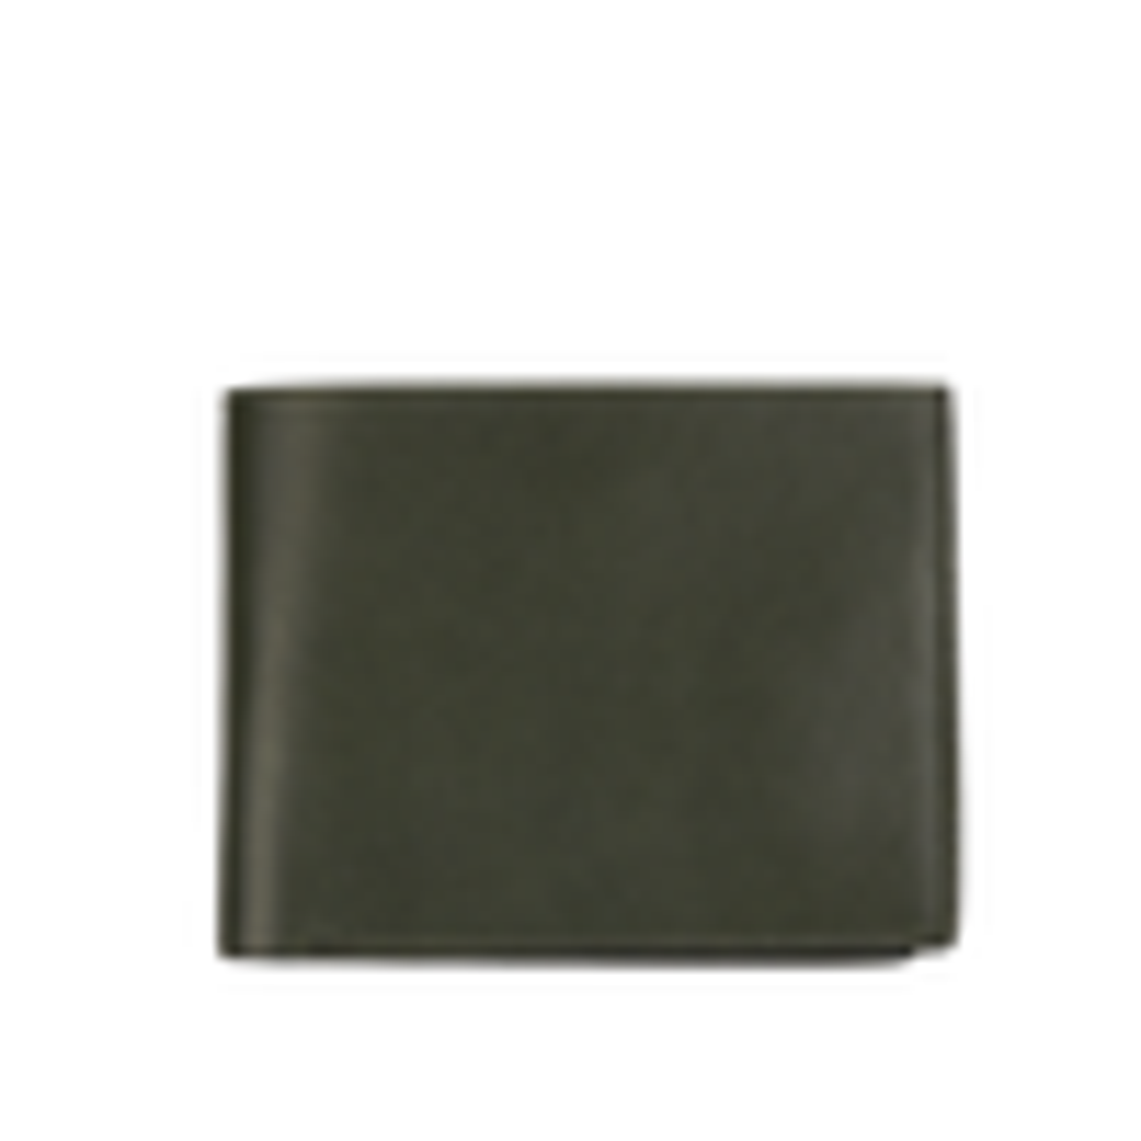 Frank Clegg Green Bifold Leather Wallet Outside